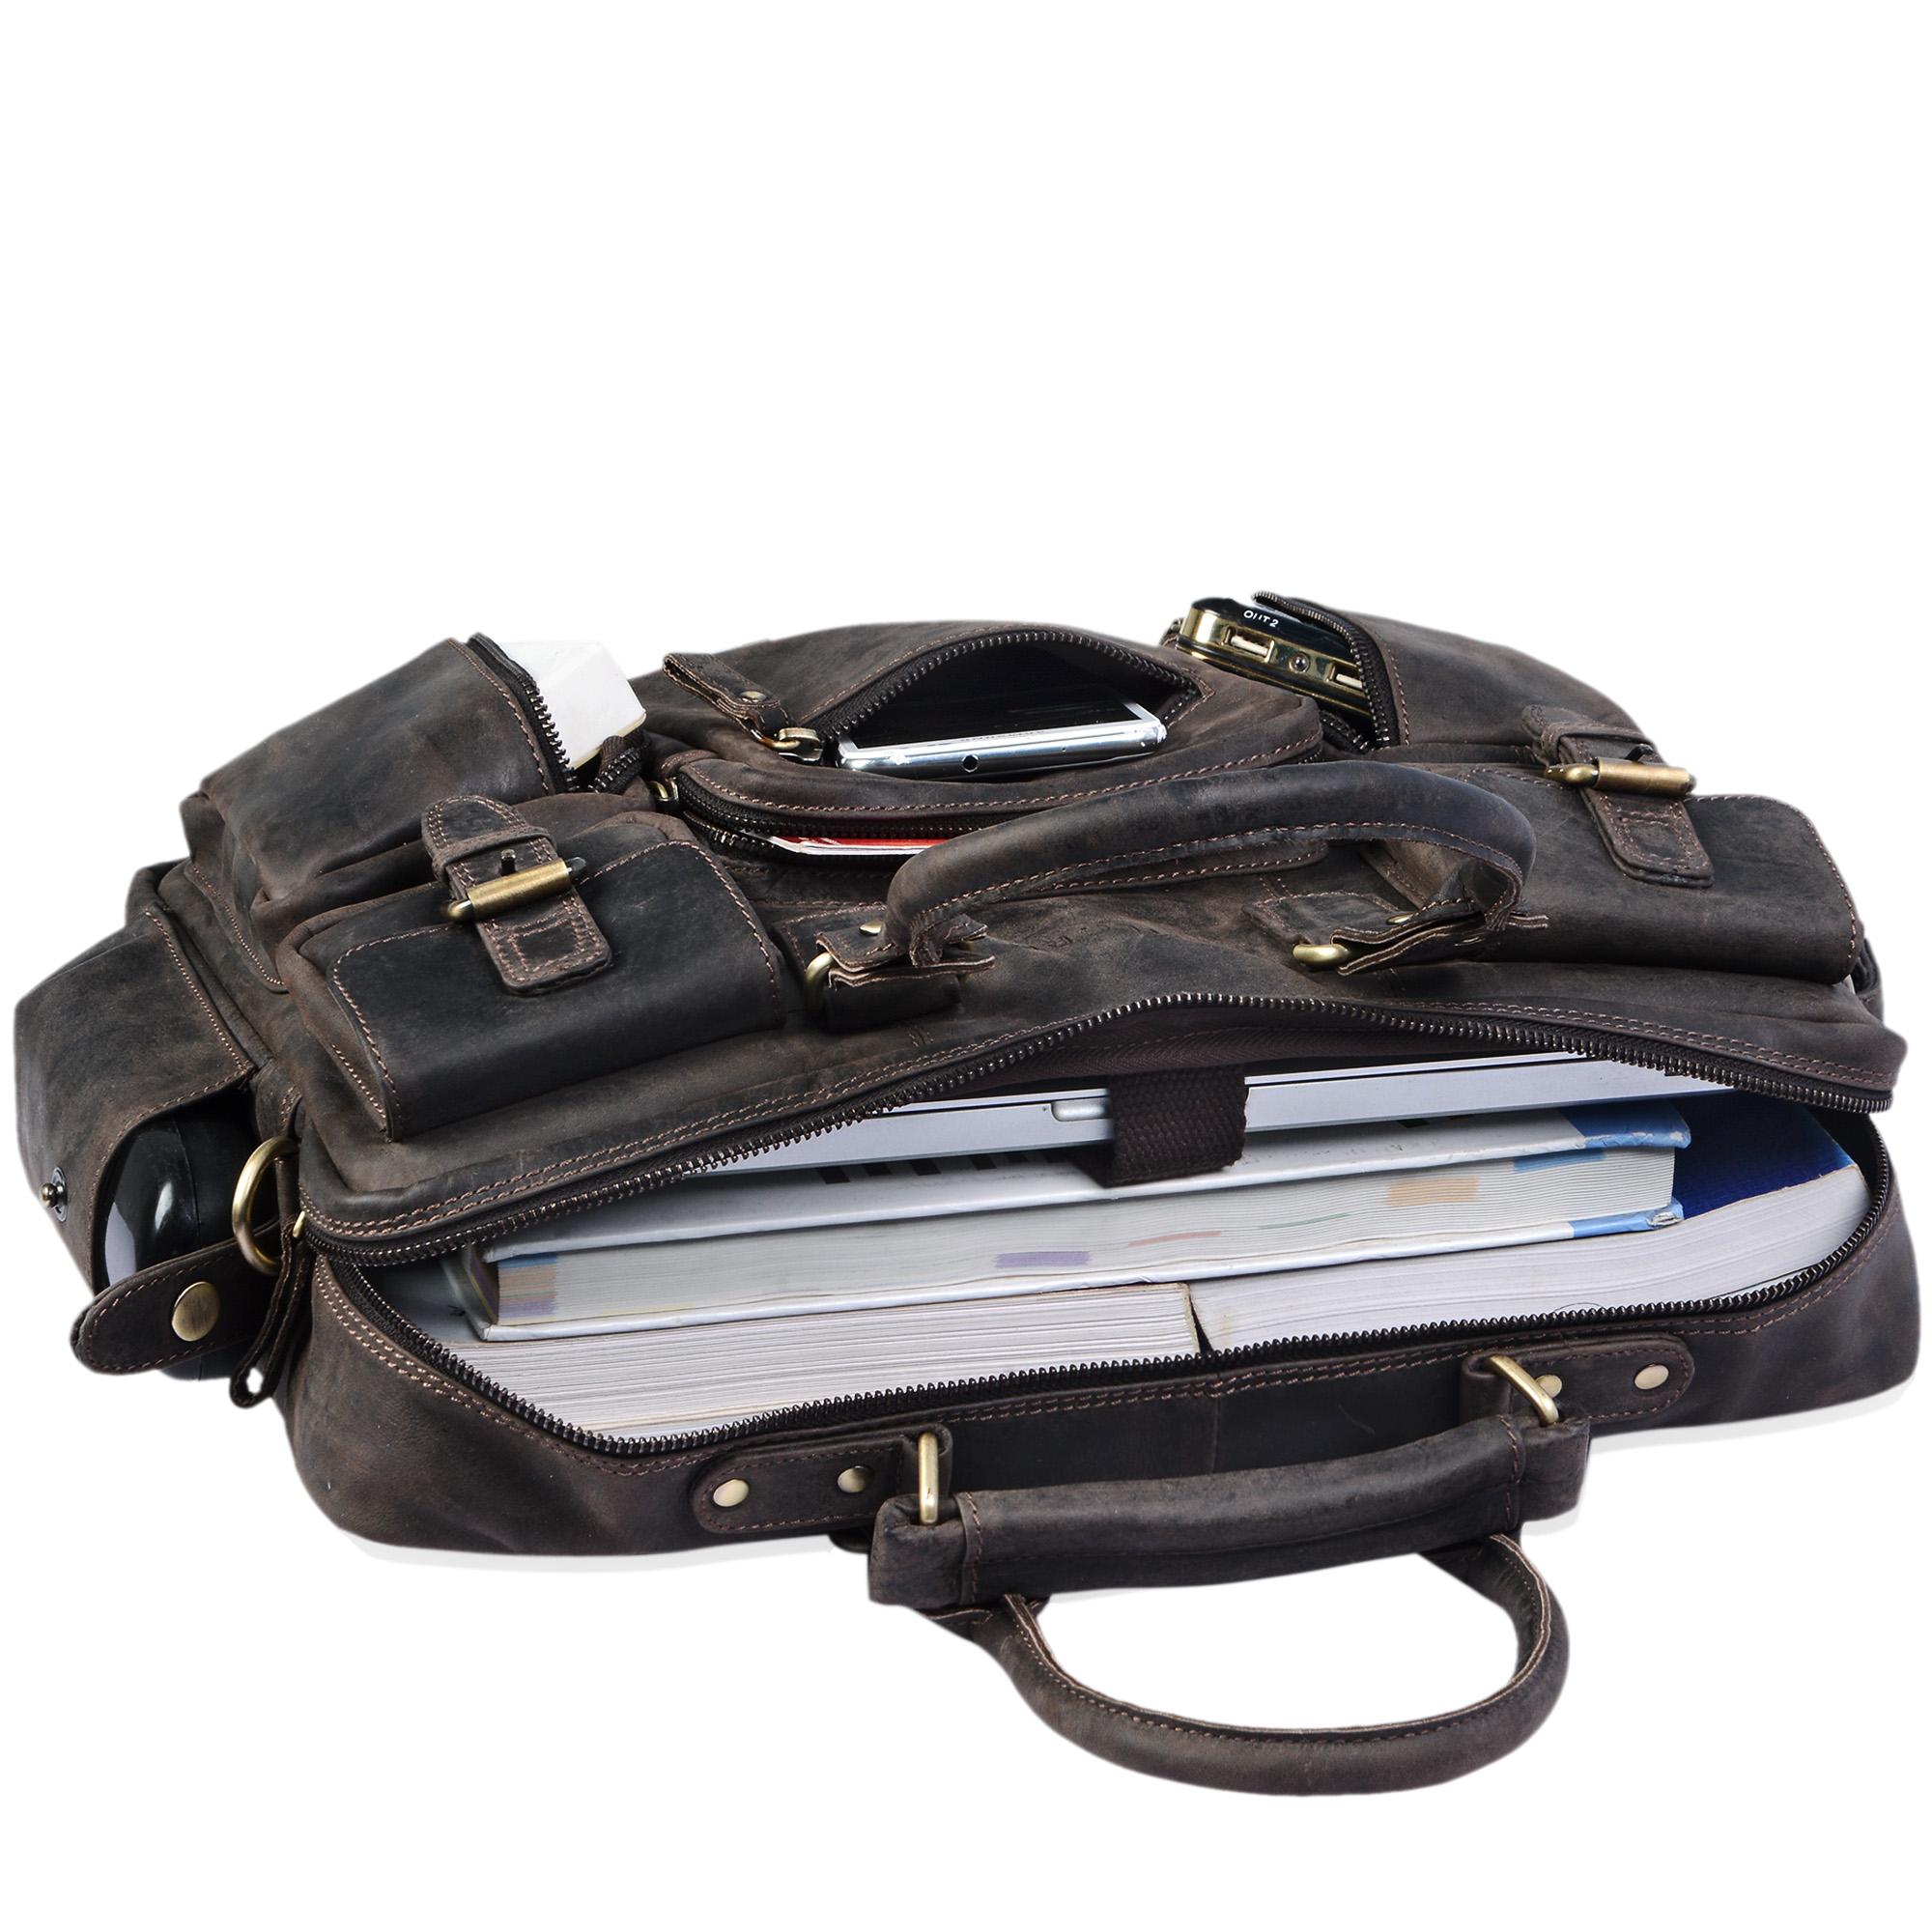 Lehrertasche Leder groß dunkelbraun